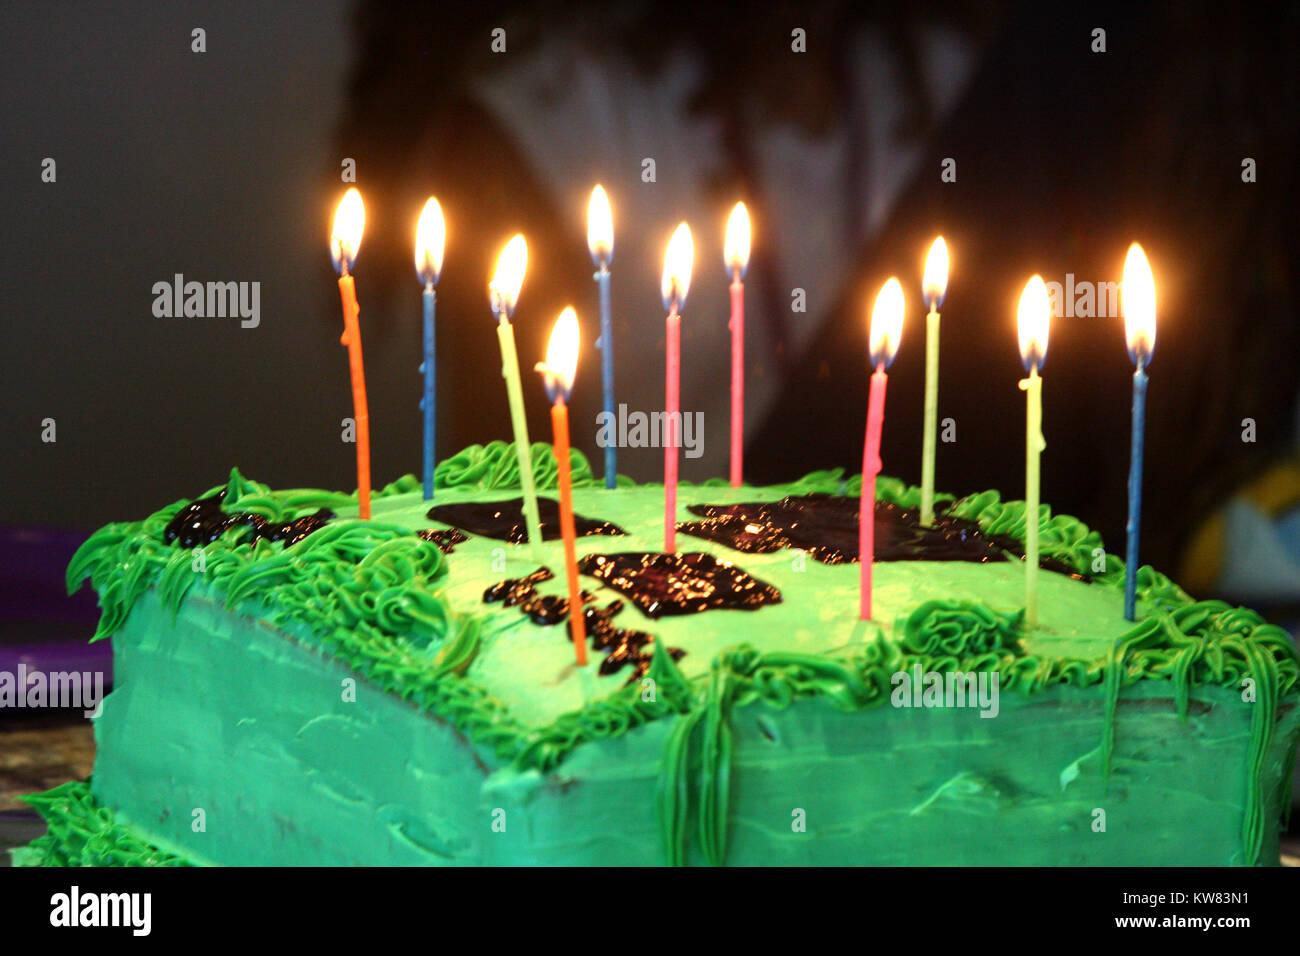 Minecraft themed birthday cake - Stock Image